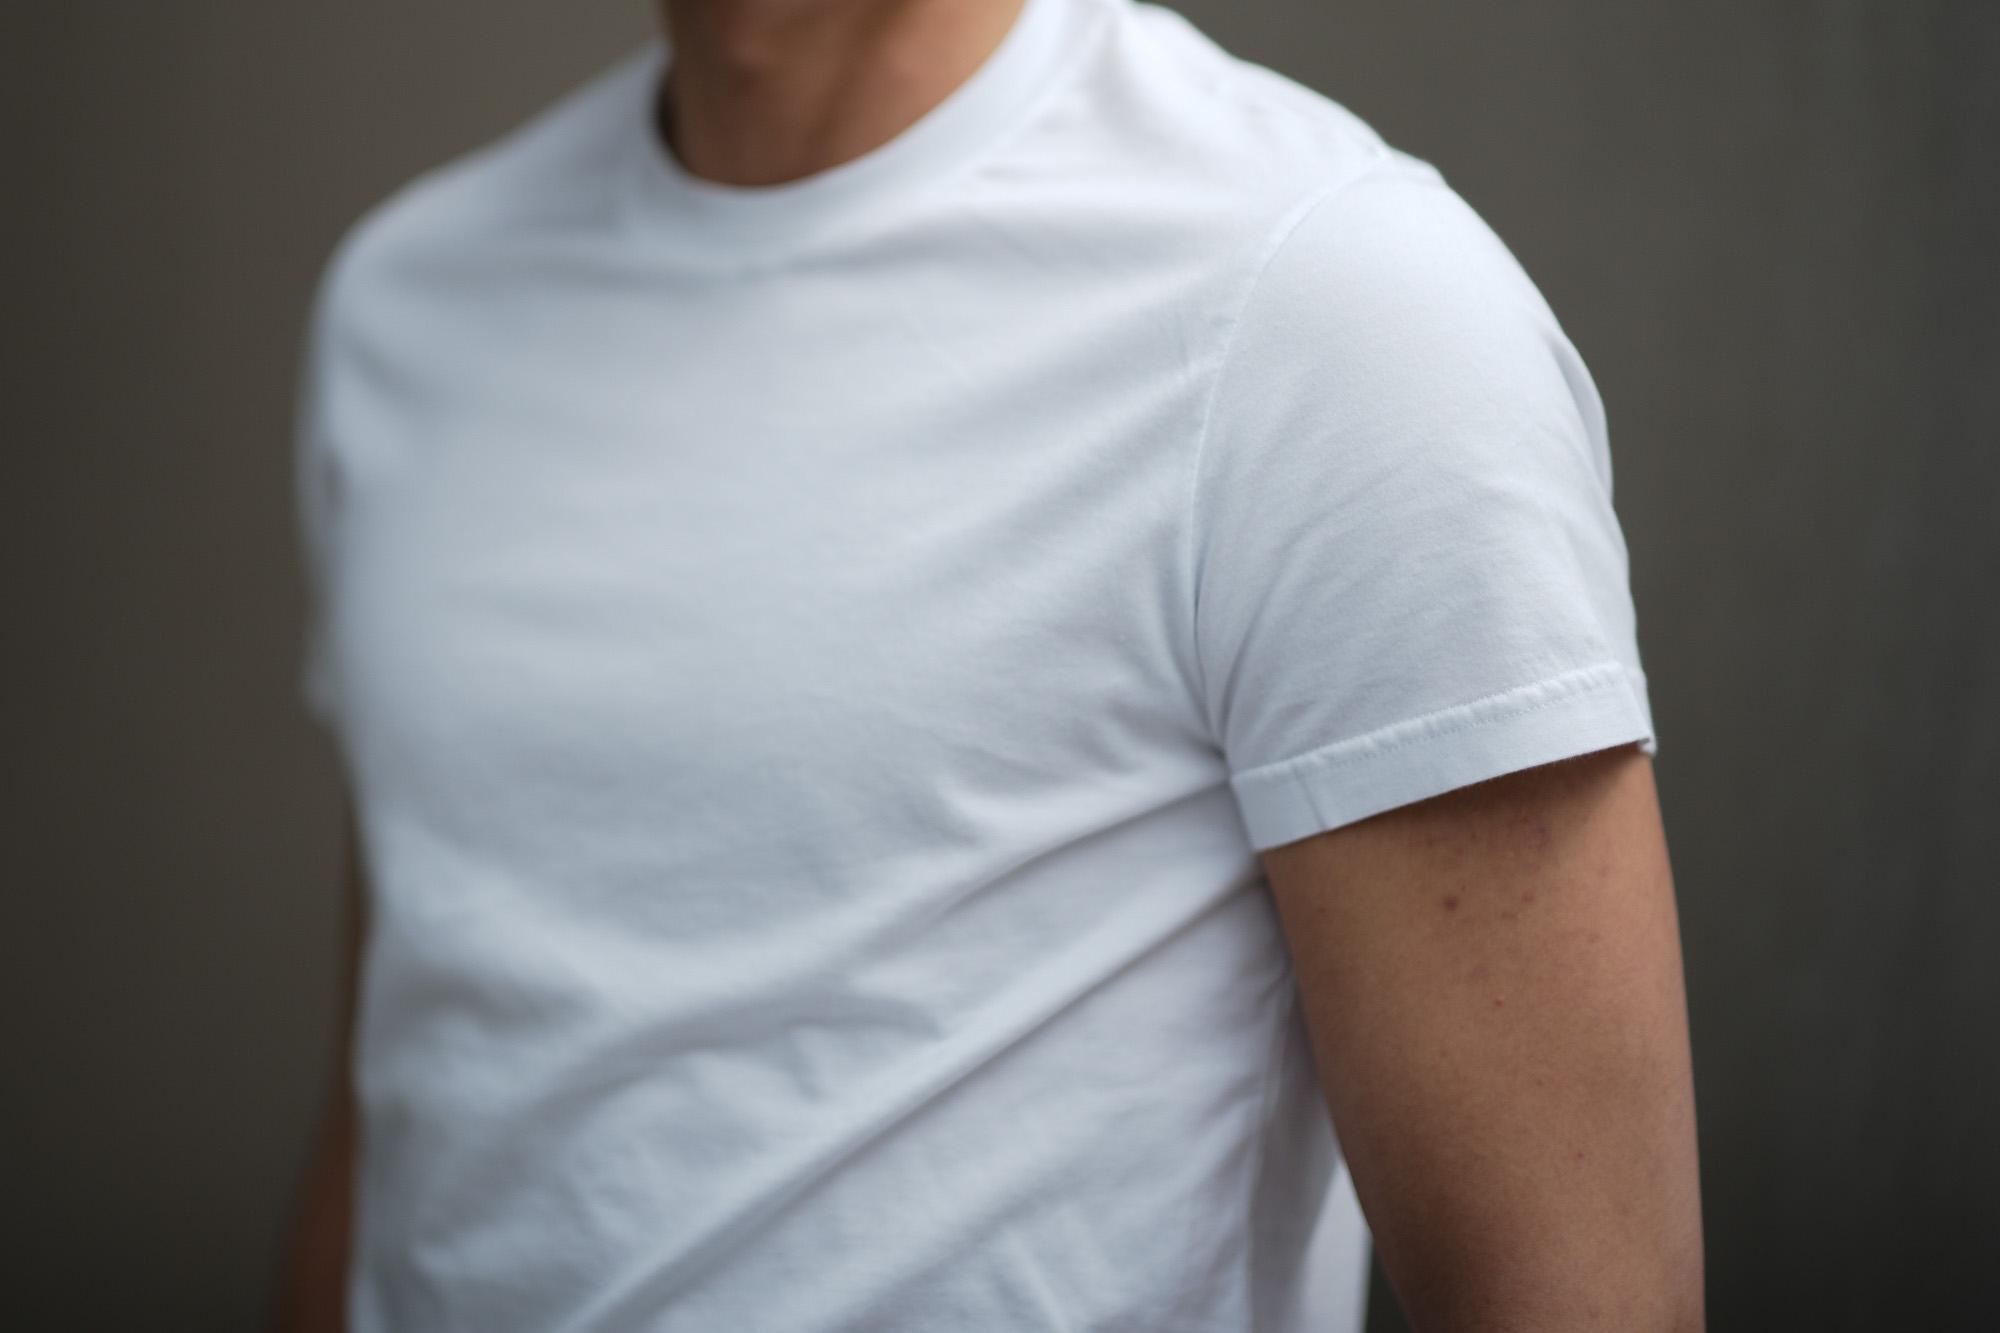 FEDELI (フェデーリ) Crew Neck T-shirt (クルーネック Tシャツ) ギザコットン Tシャツ WHITE (ホワイト・41) made in italy (イタリア製) 2019 春夏新作 愛知 名古屋 altoediritto アルトエデリット